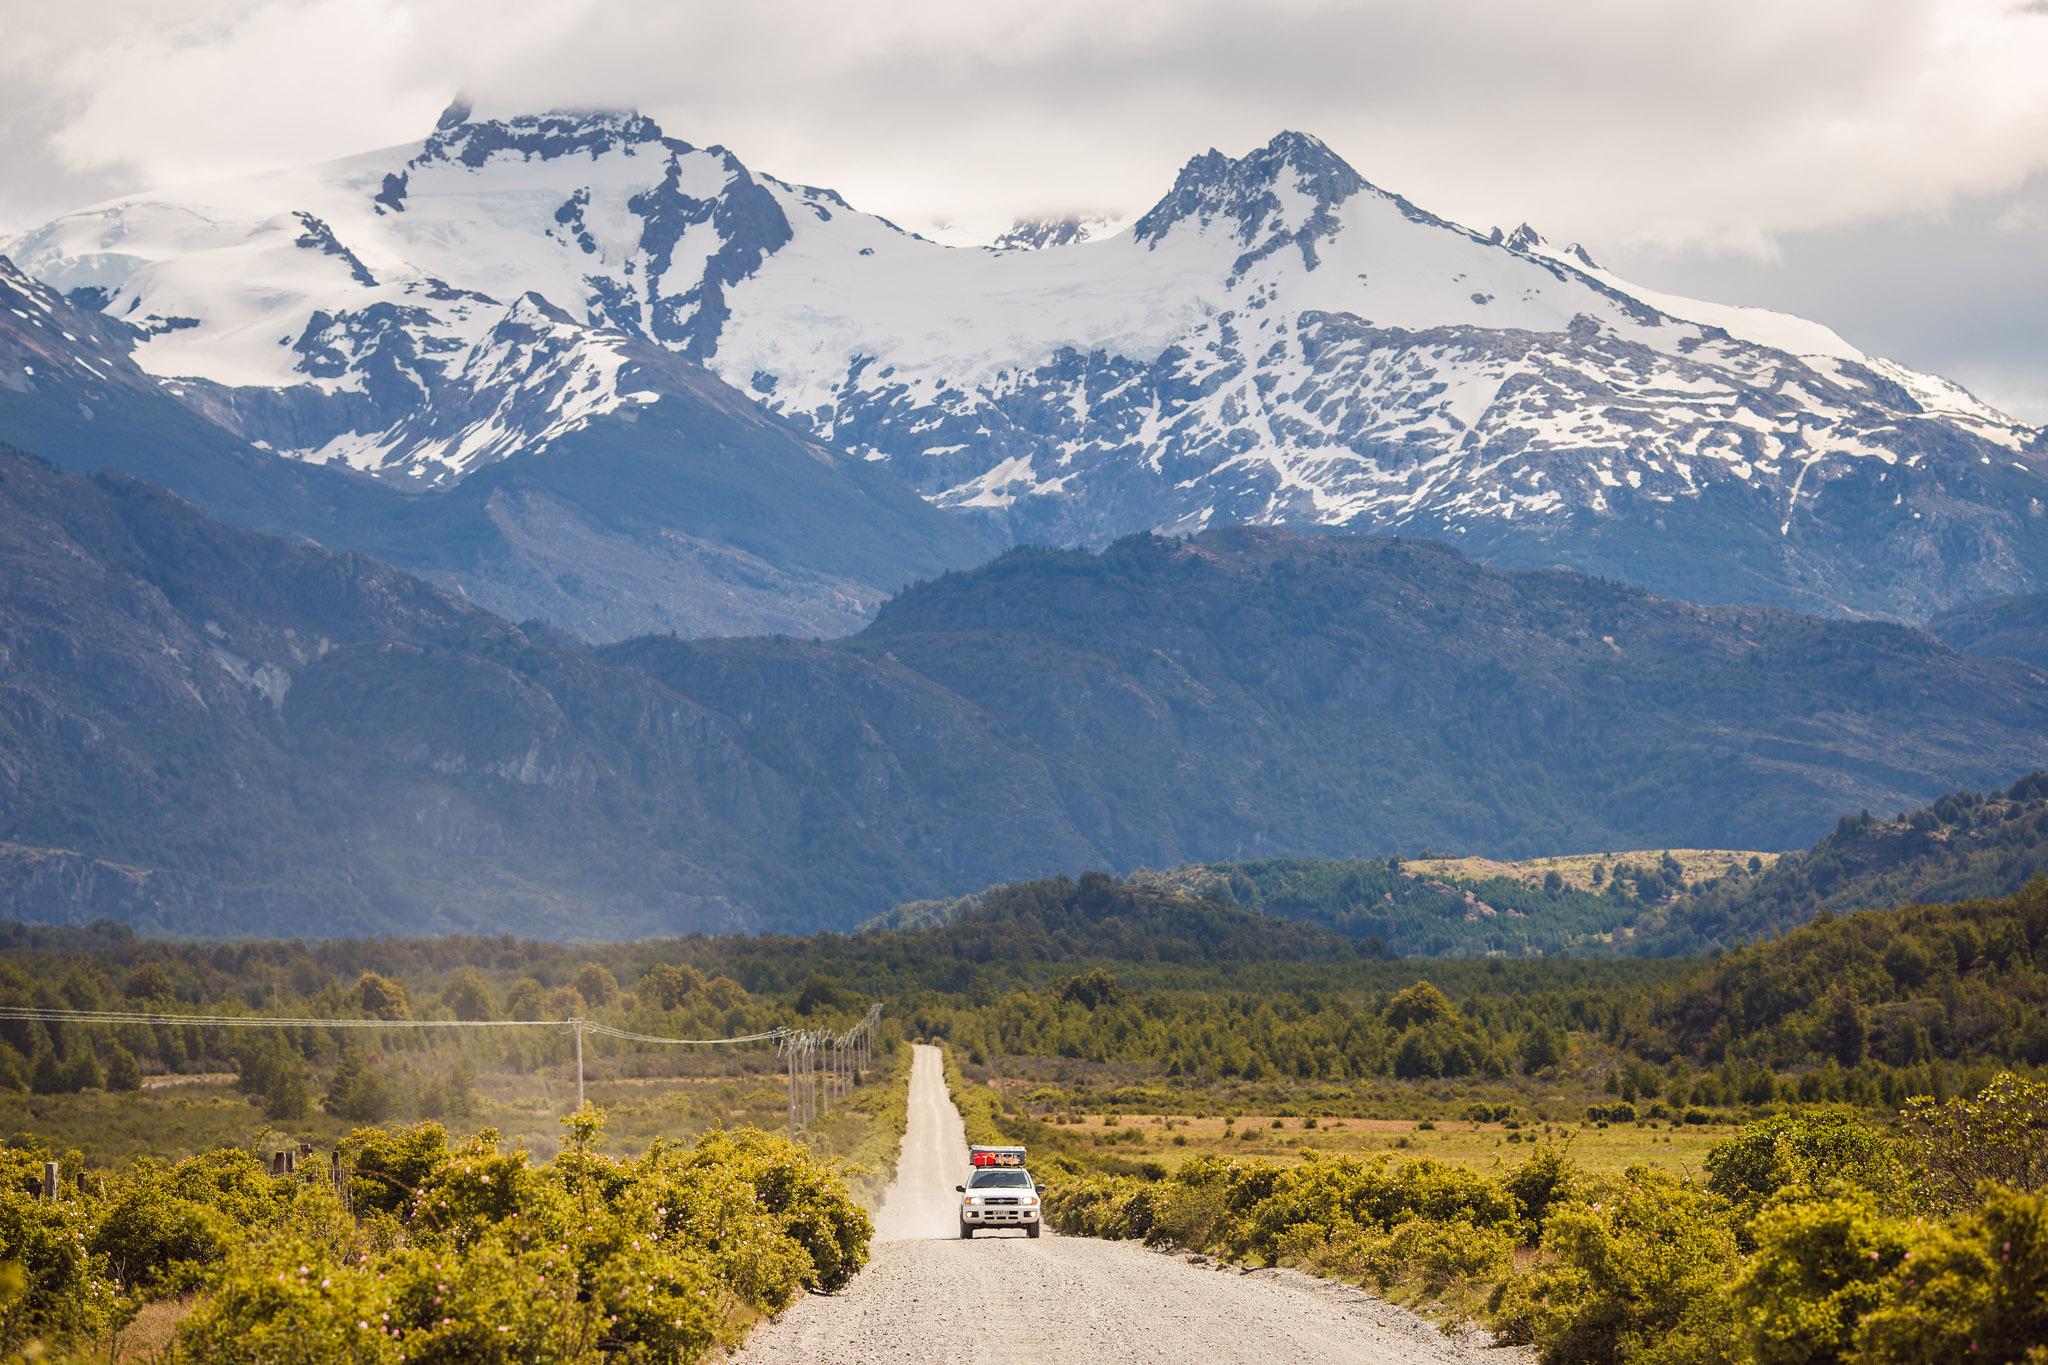 pablo-antonio-nissan-pathfinder-mountains-road-chile-argentina